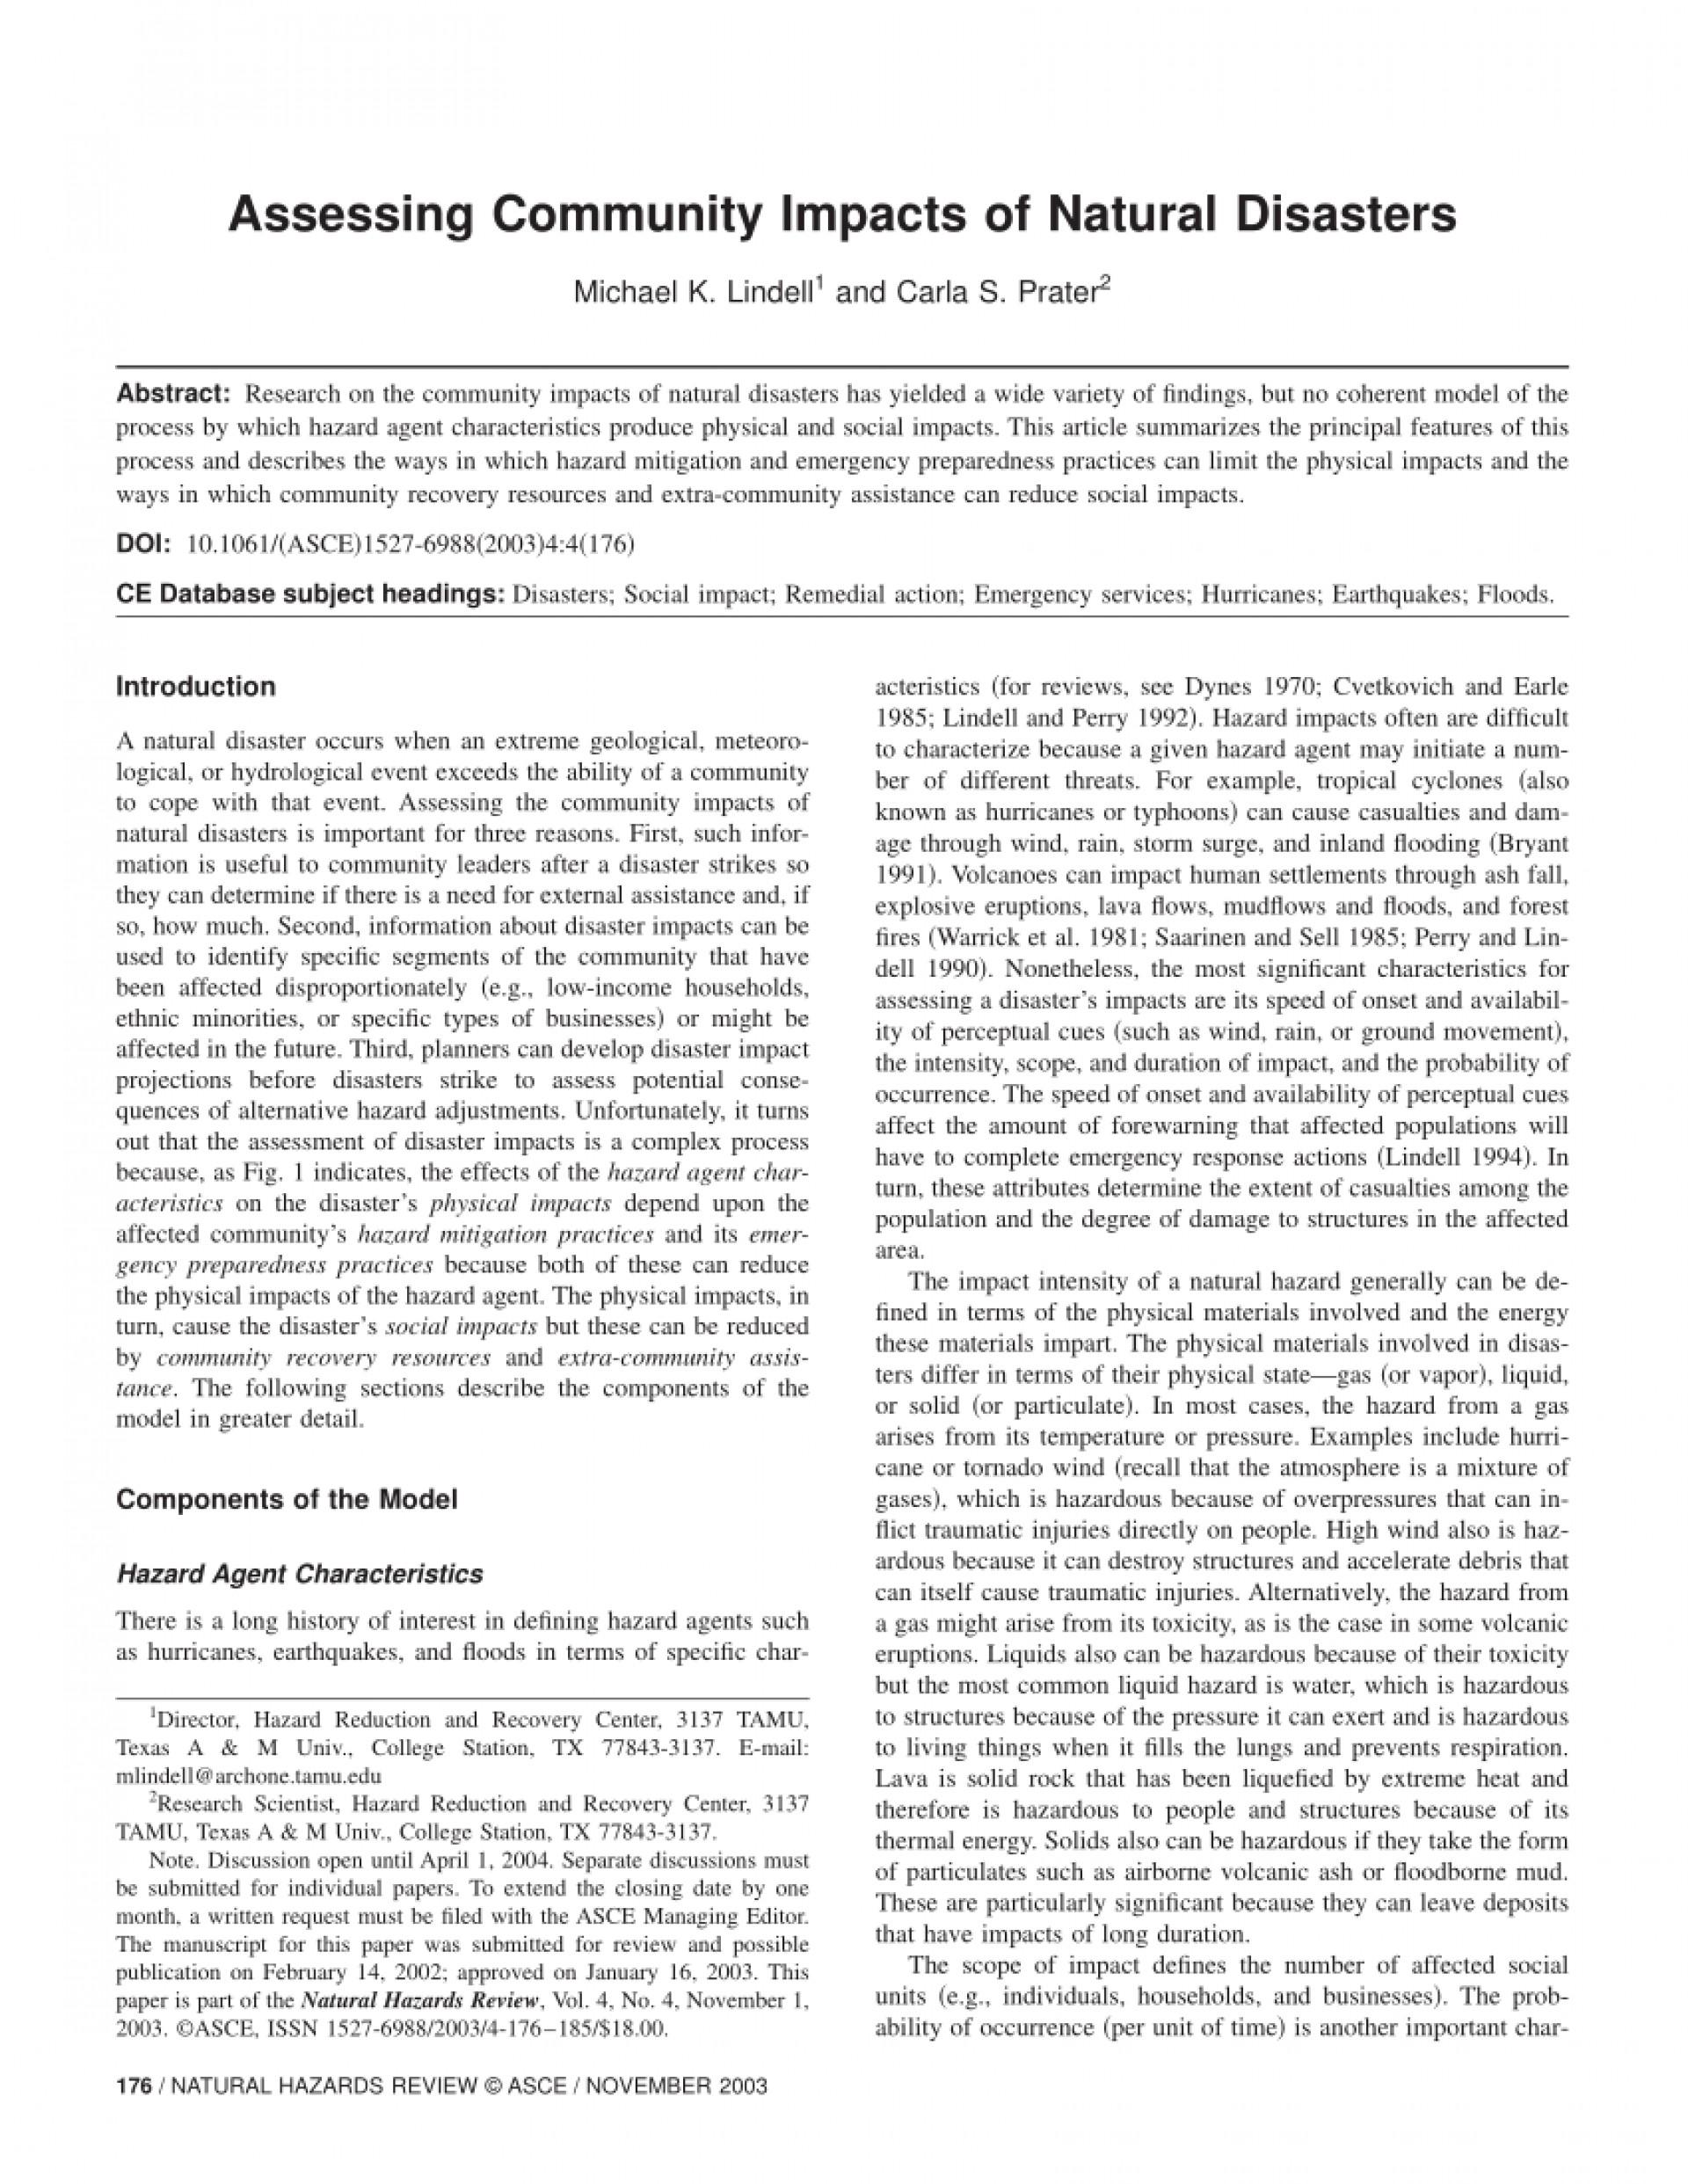 Opinion essay sample topics